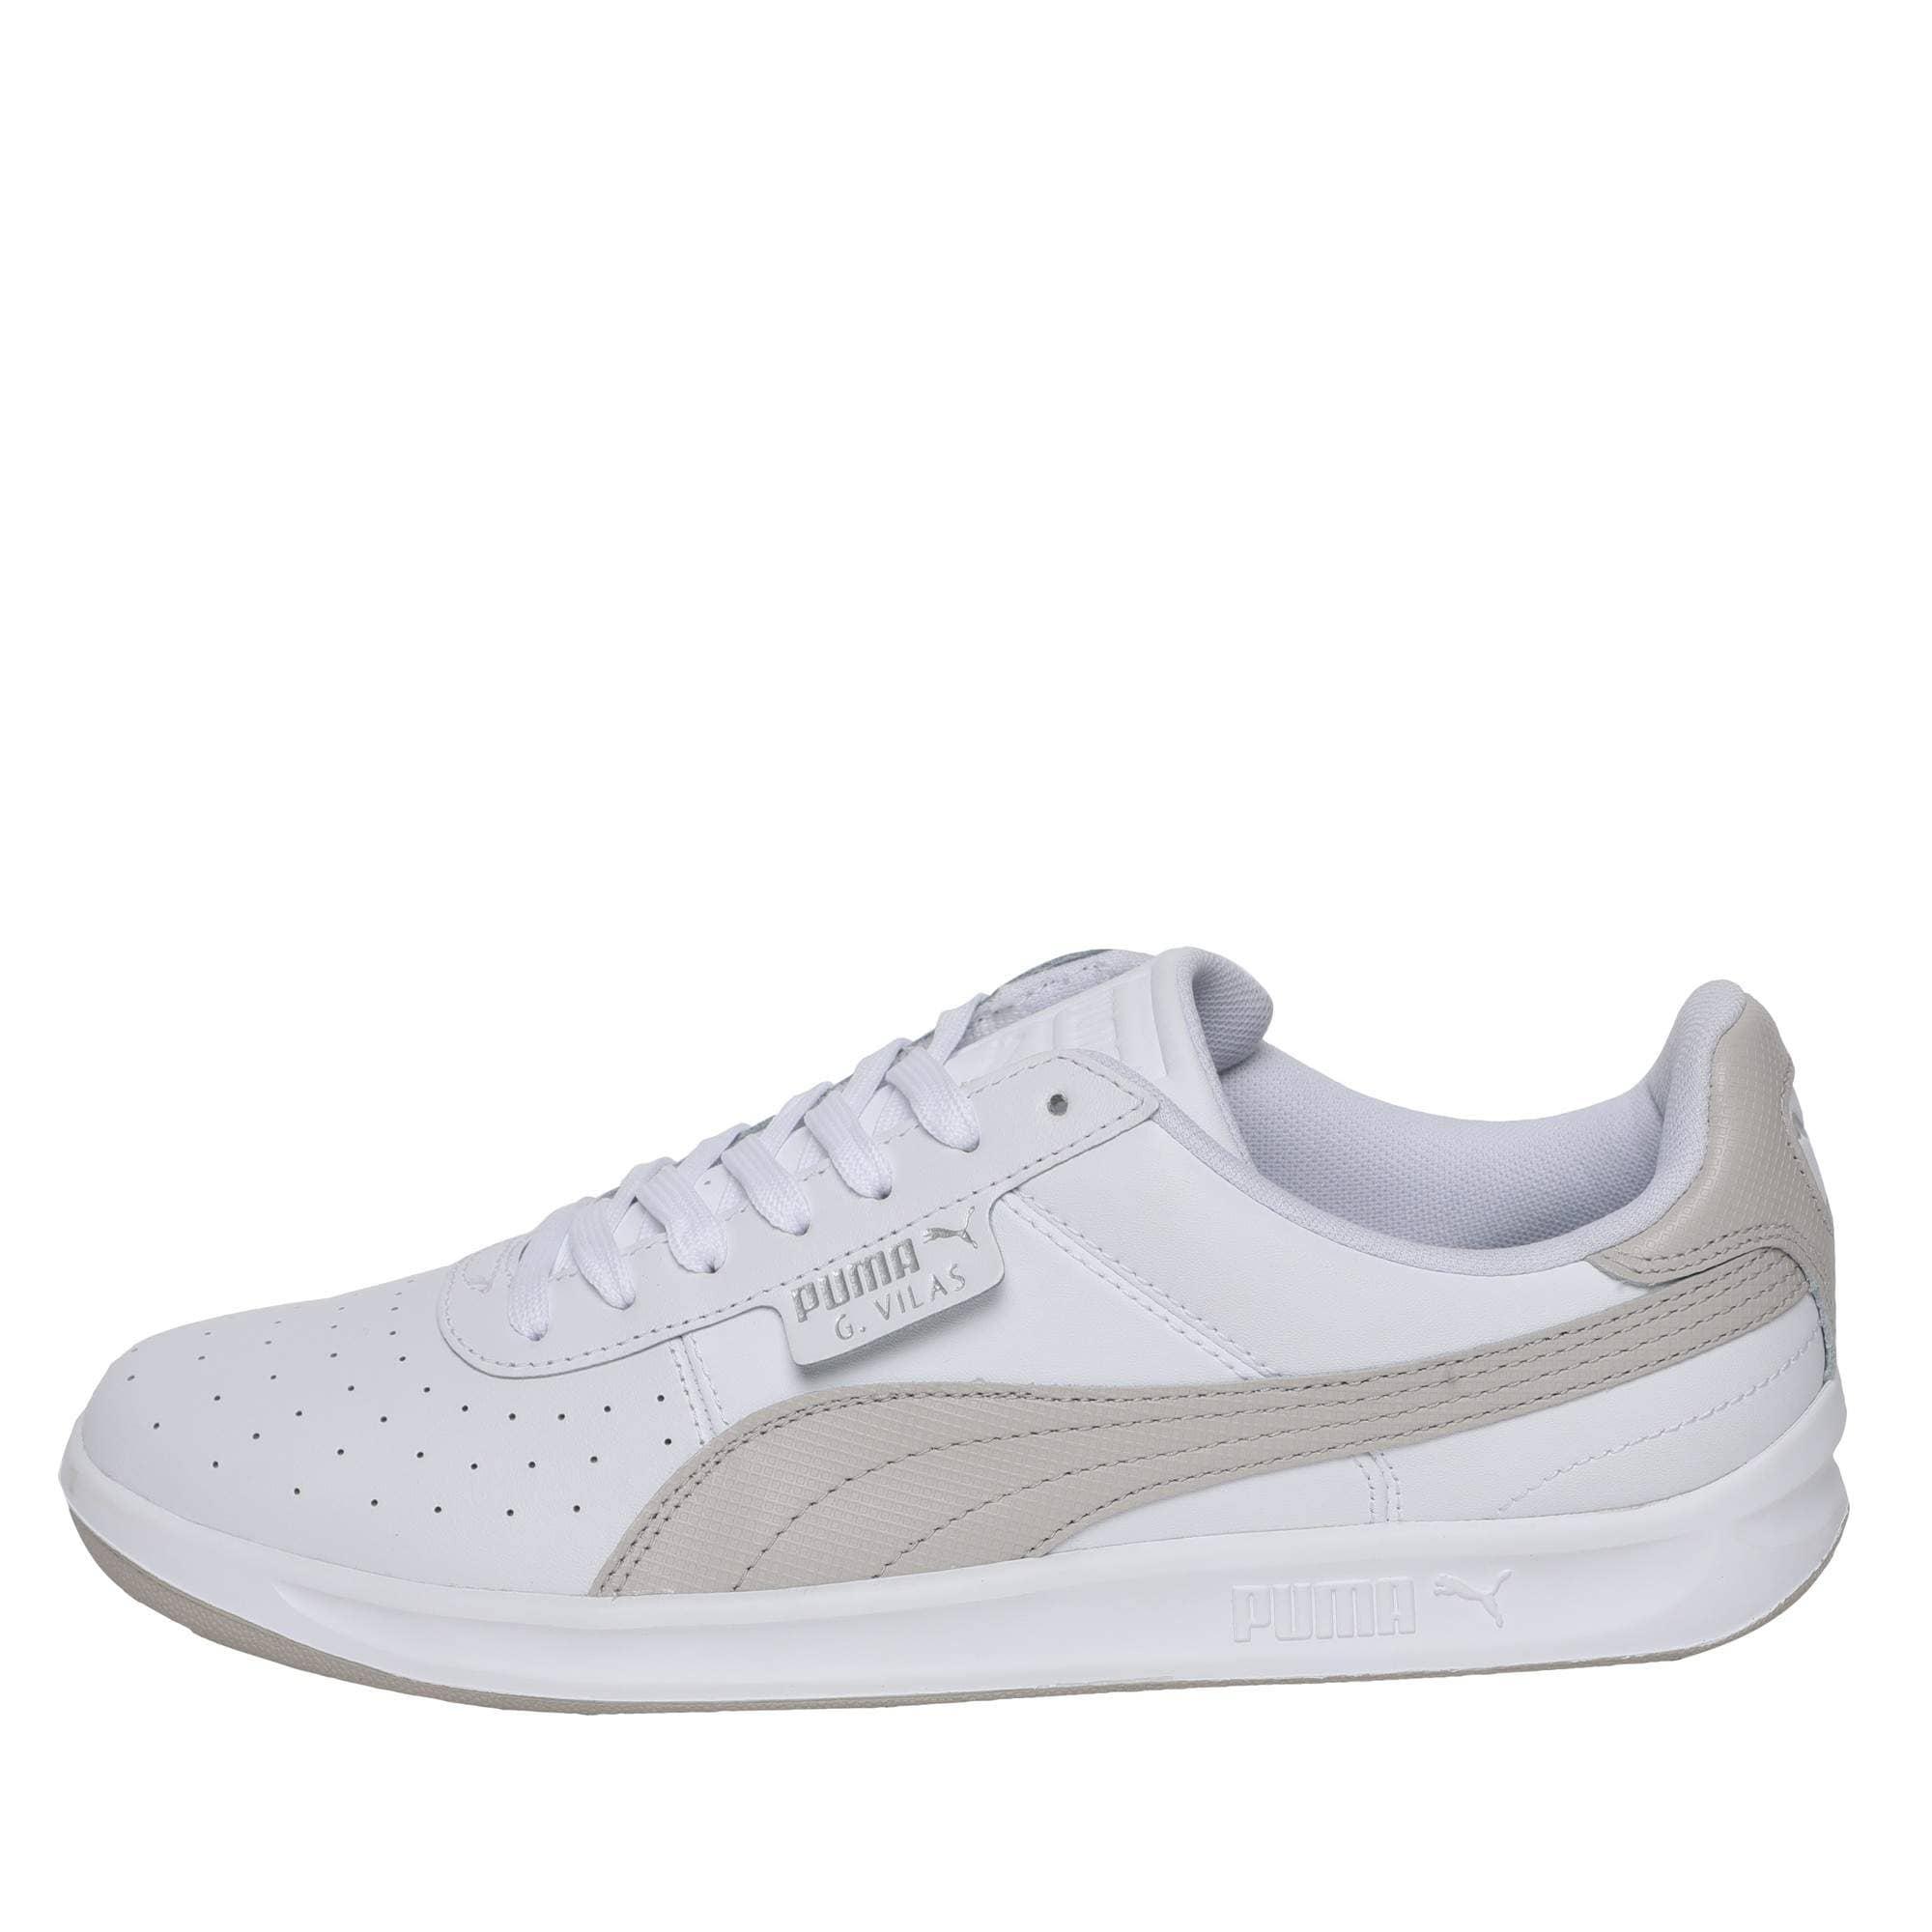 Buy Puma G. Vilas 2 Men [362859] White